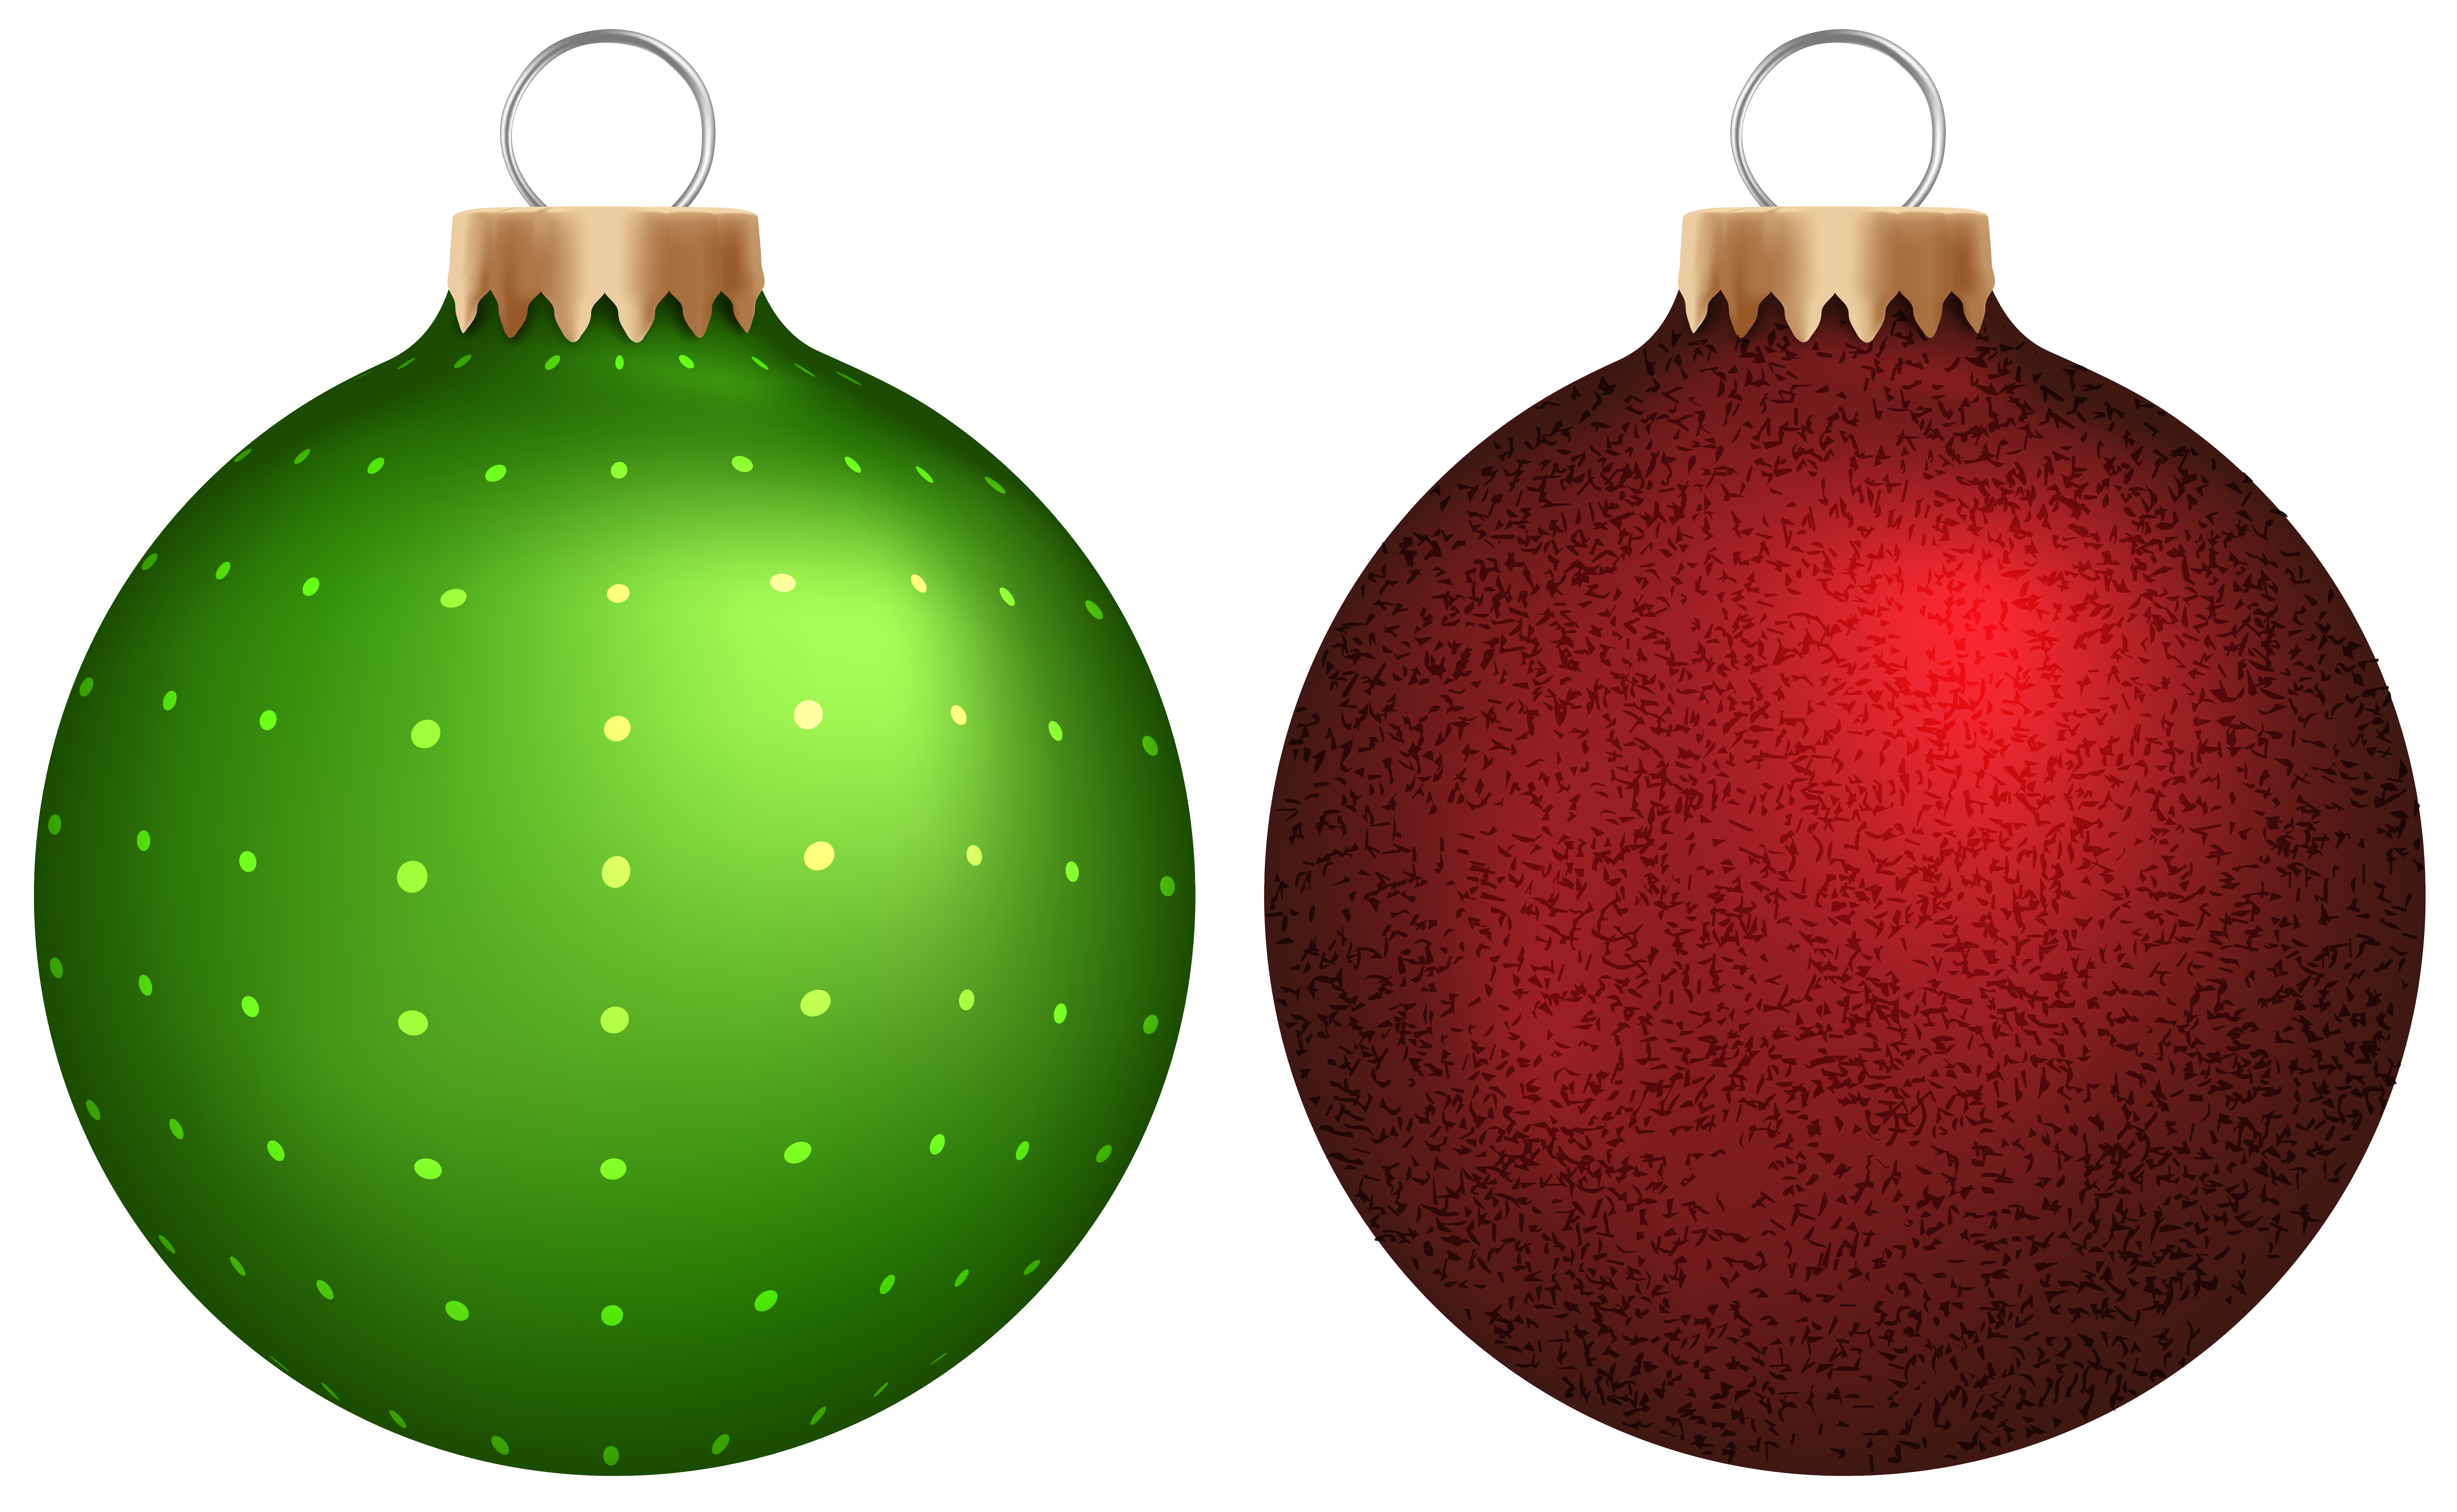 8754x5387 Christmas Light Bulb Outline Clip Art. Garbage Truck Daily